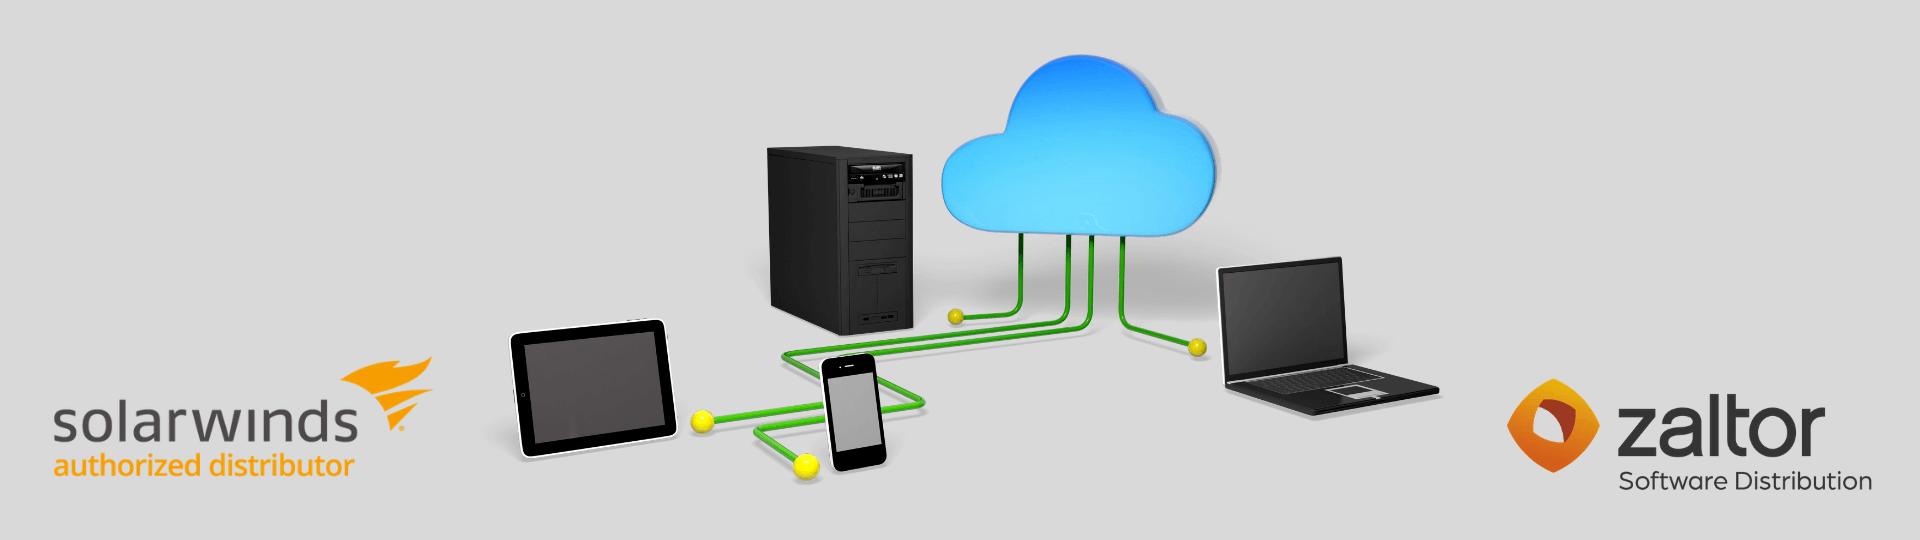 solarwinds backup distribuidor